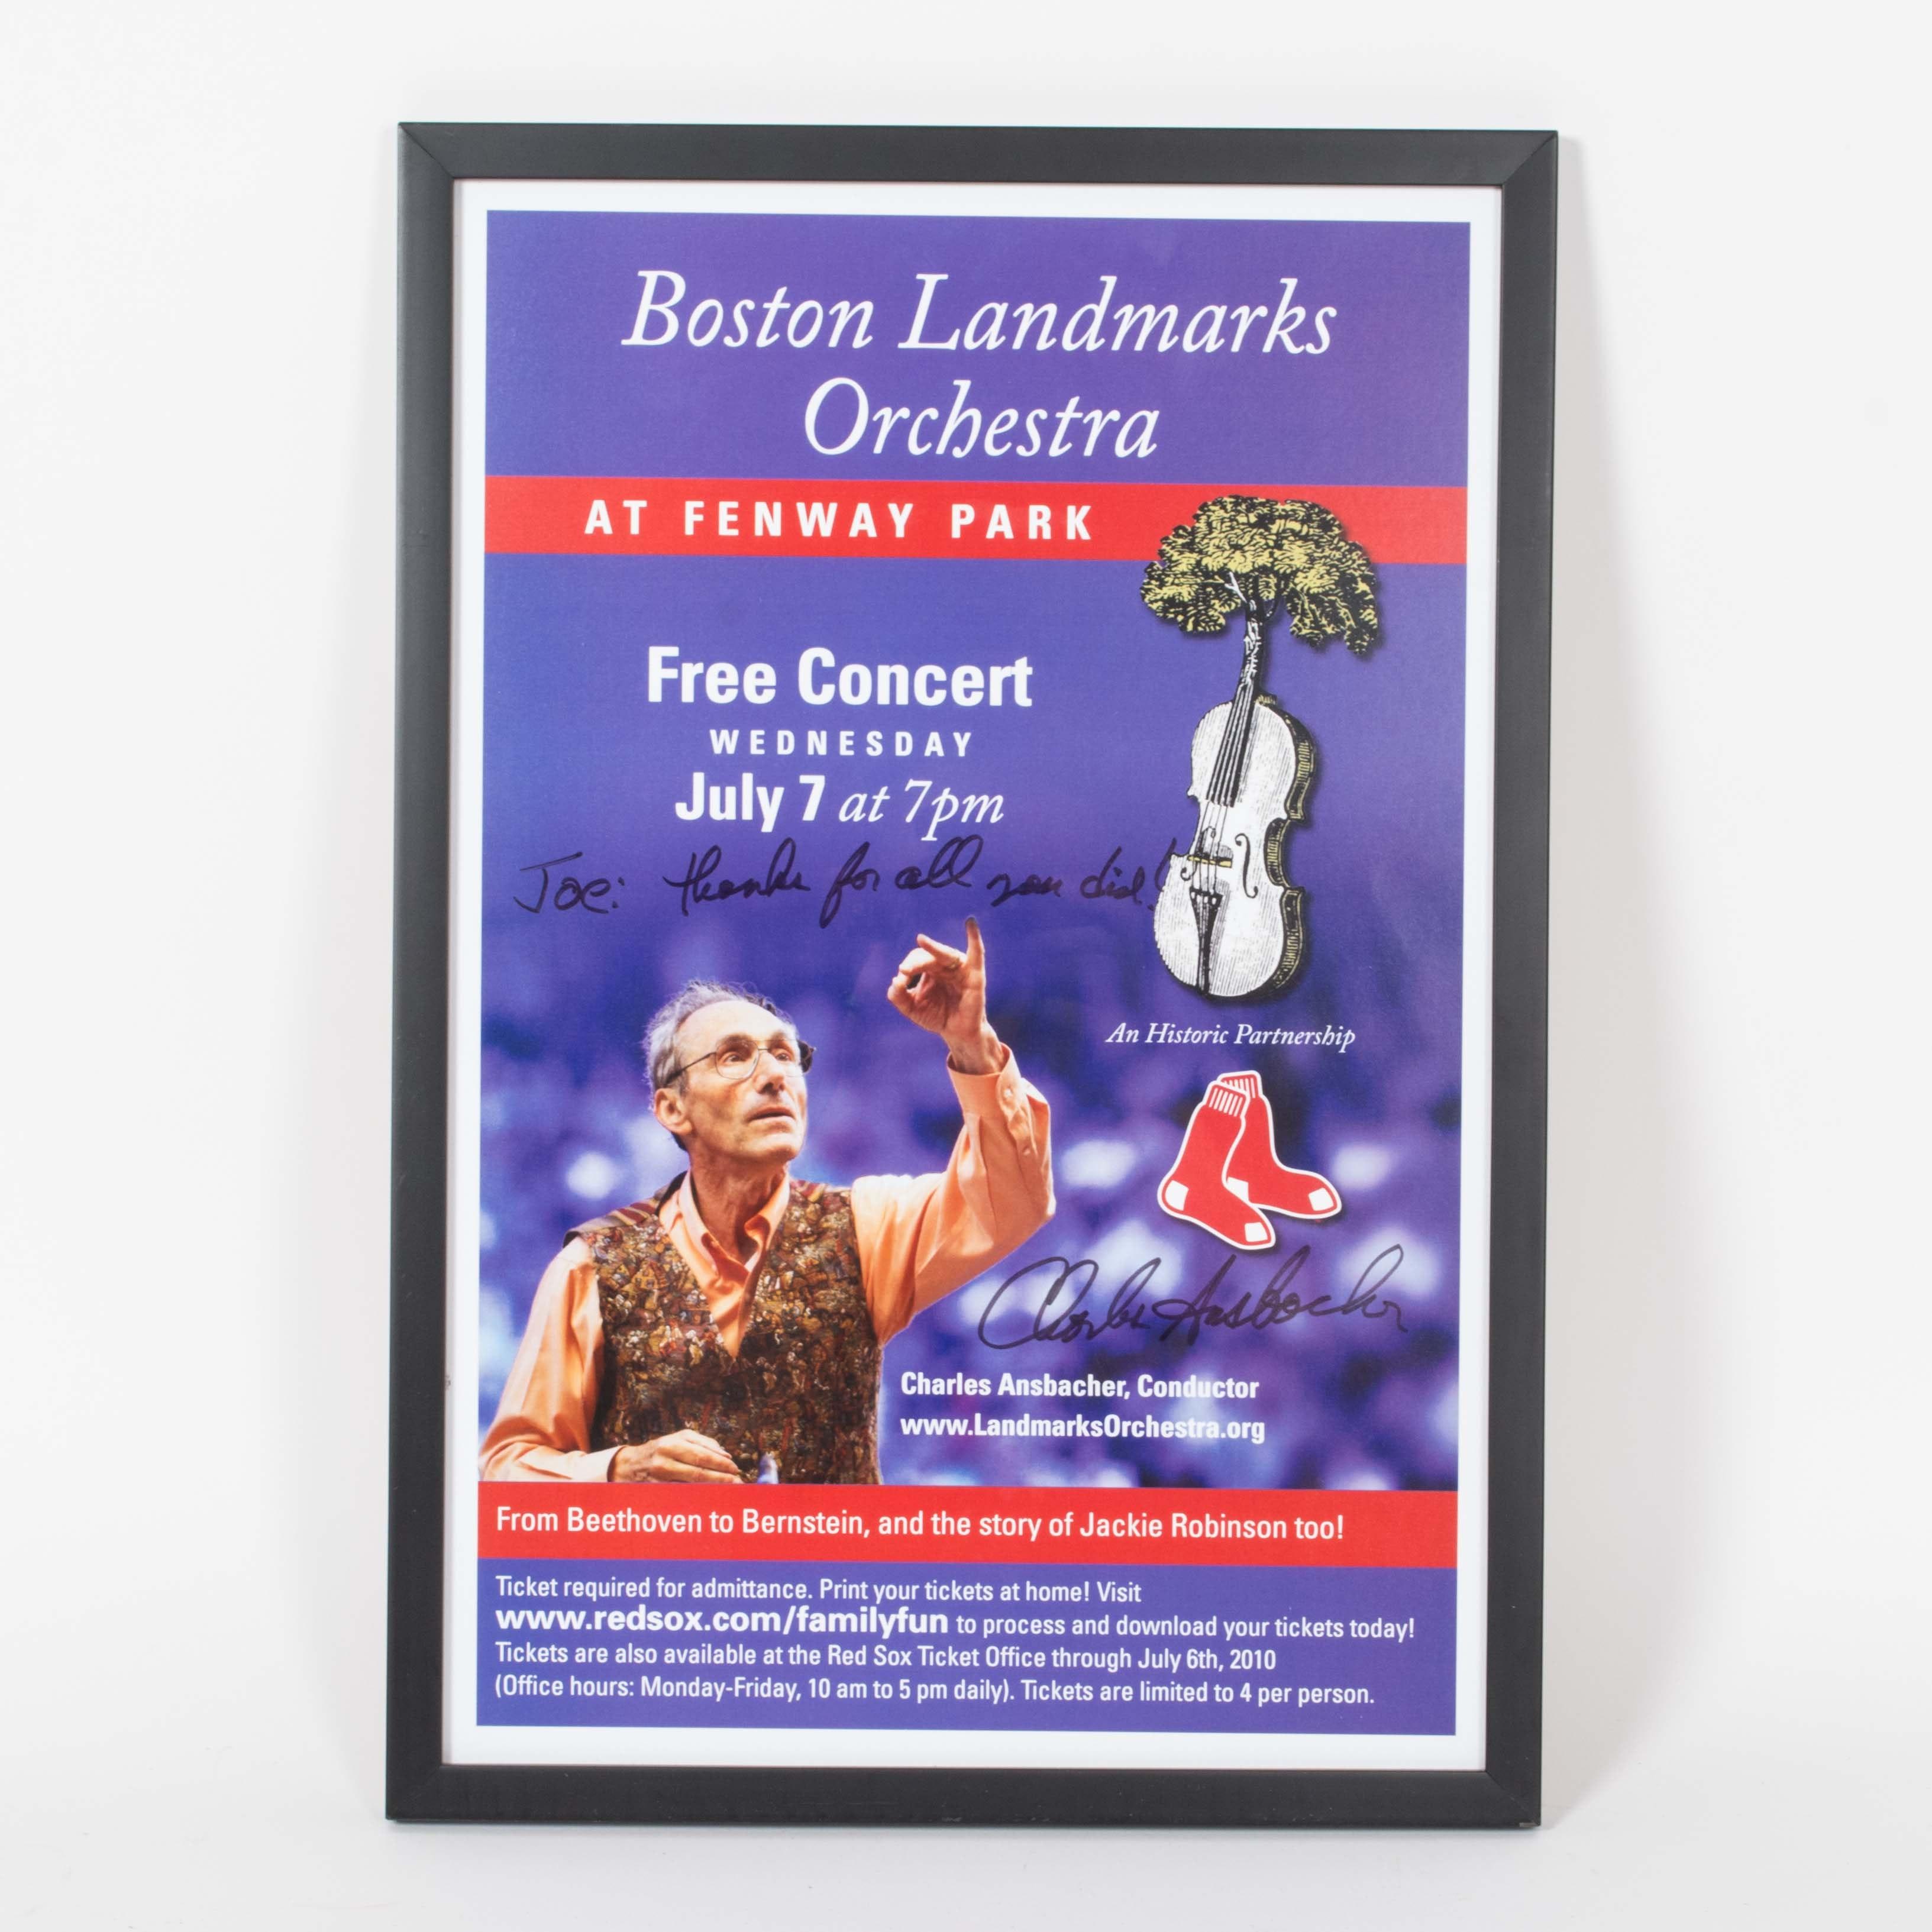 Signed Charles Ansbacher Boston Landmarks Orchestra Poster